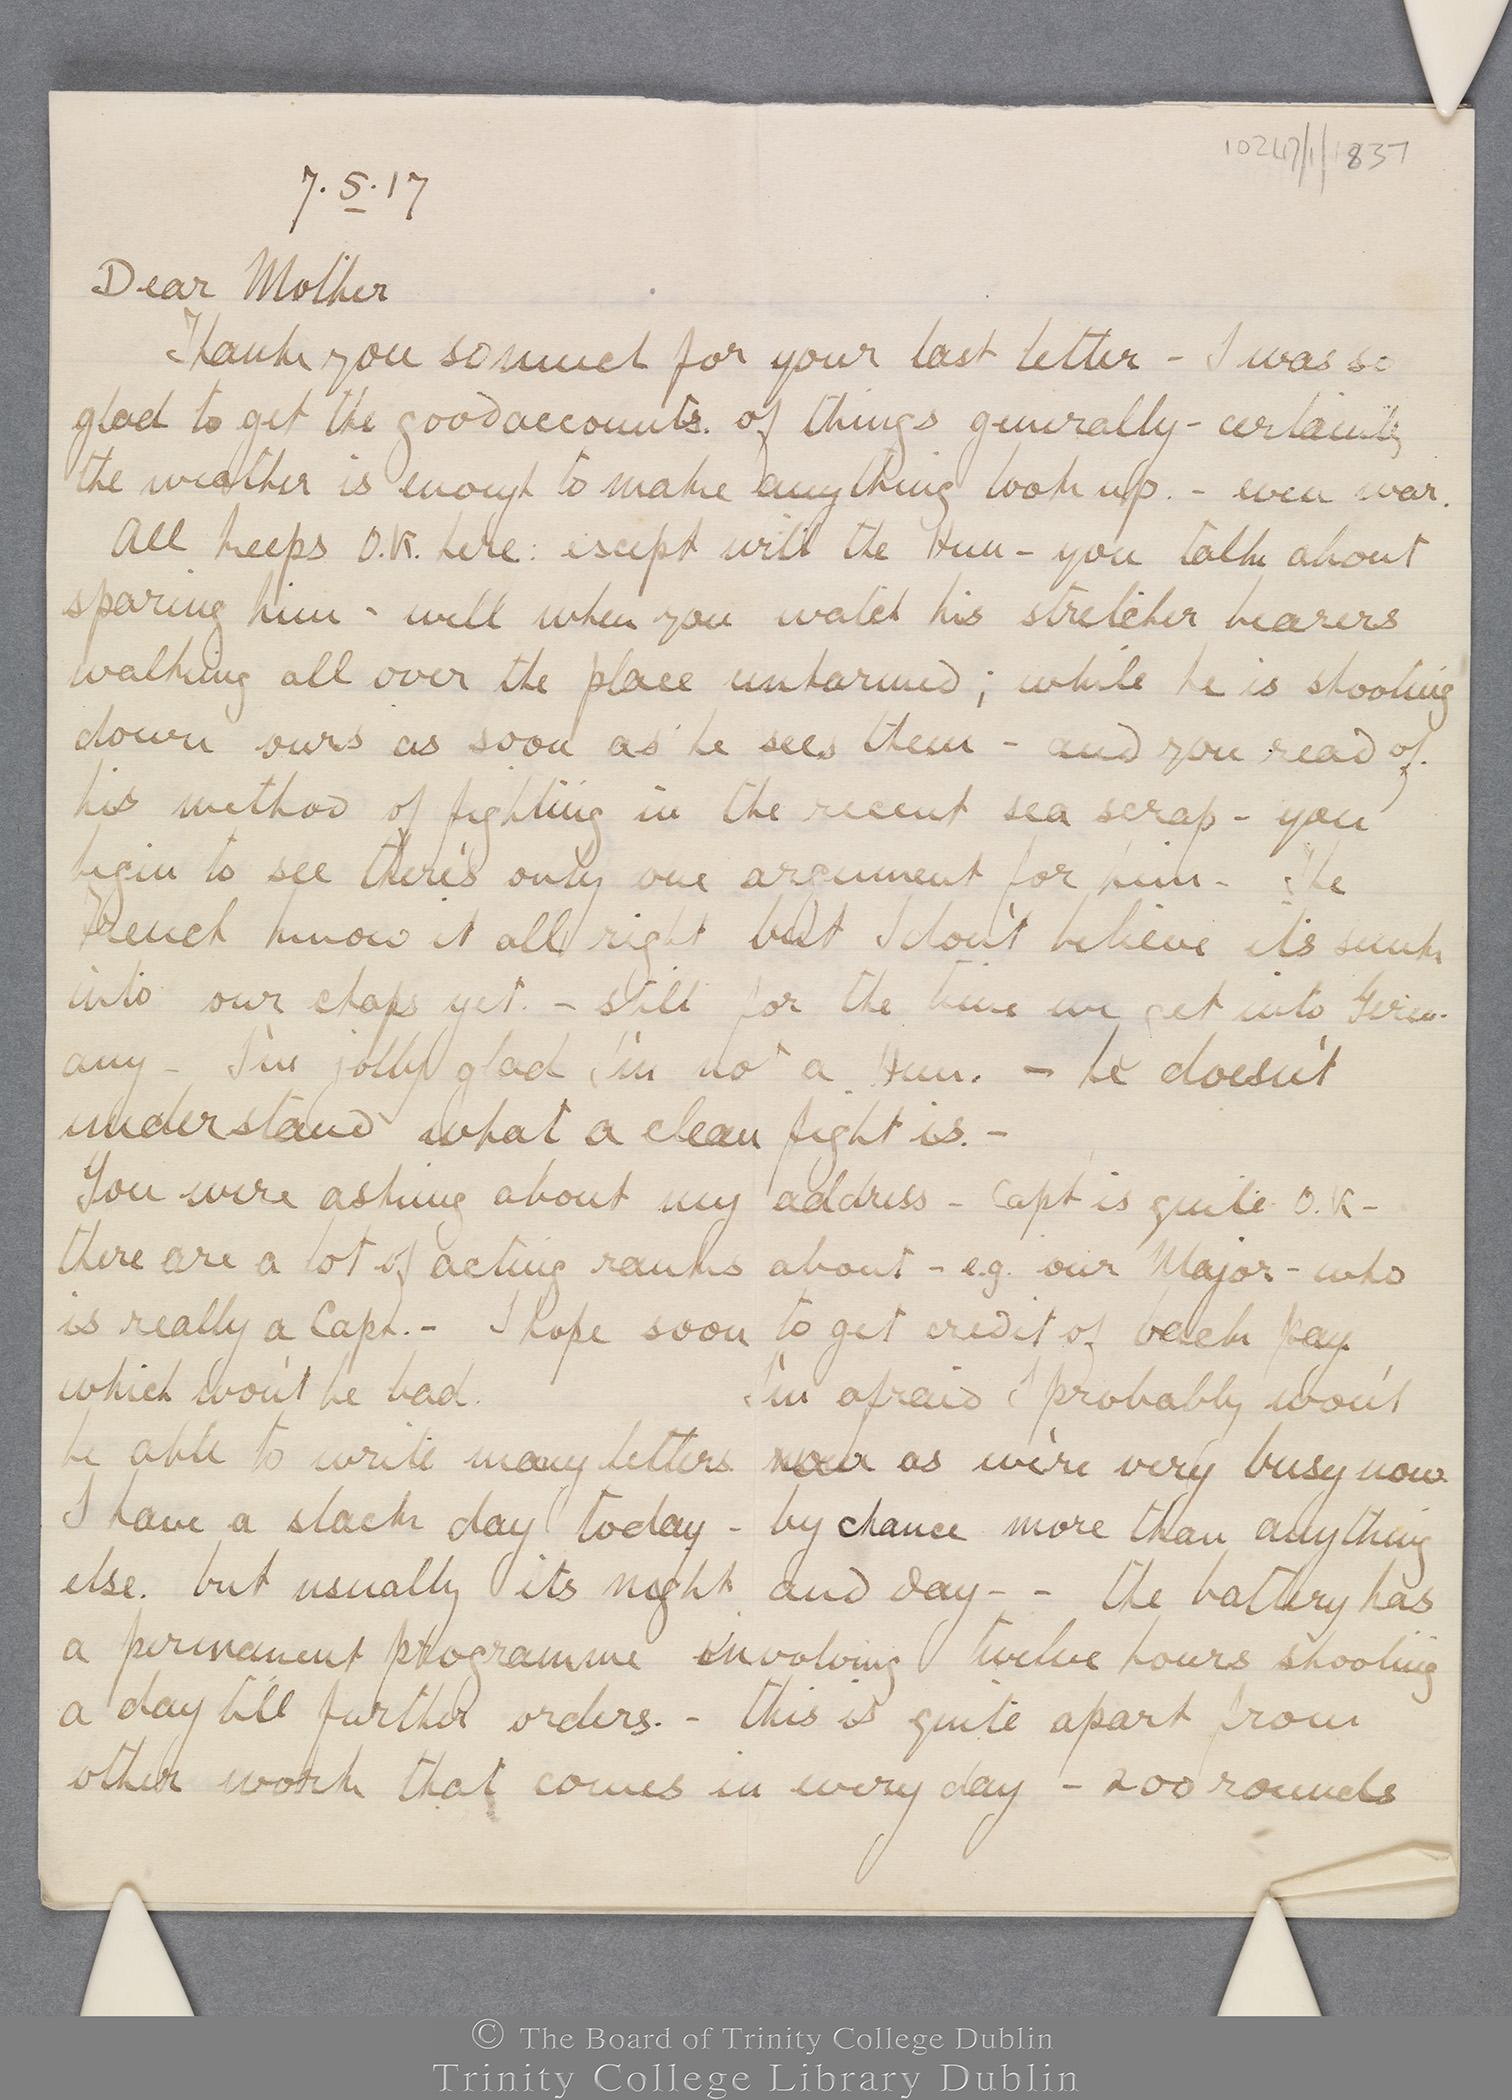 TCD MS 10247/1/837 folio 1 recto